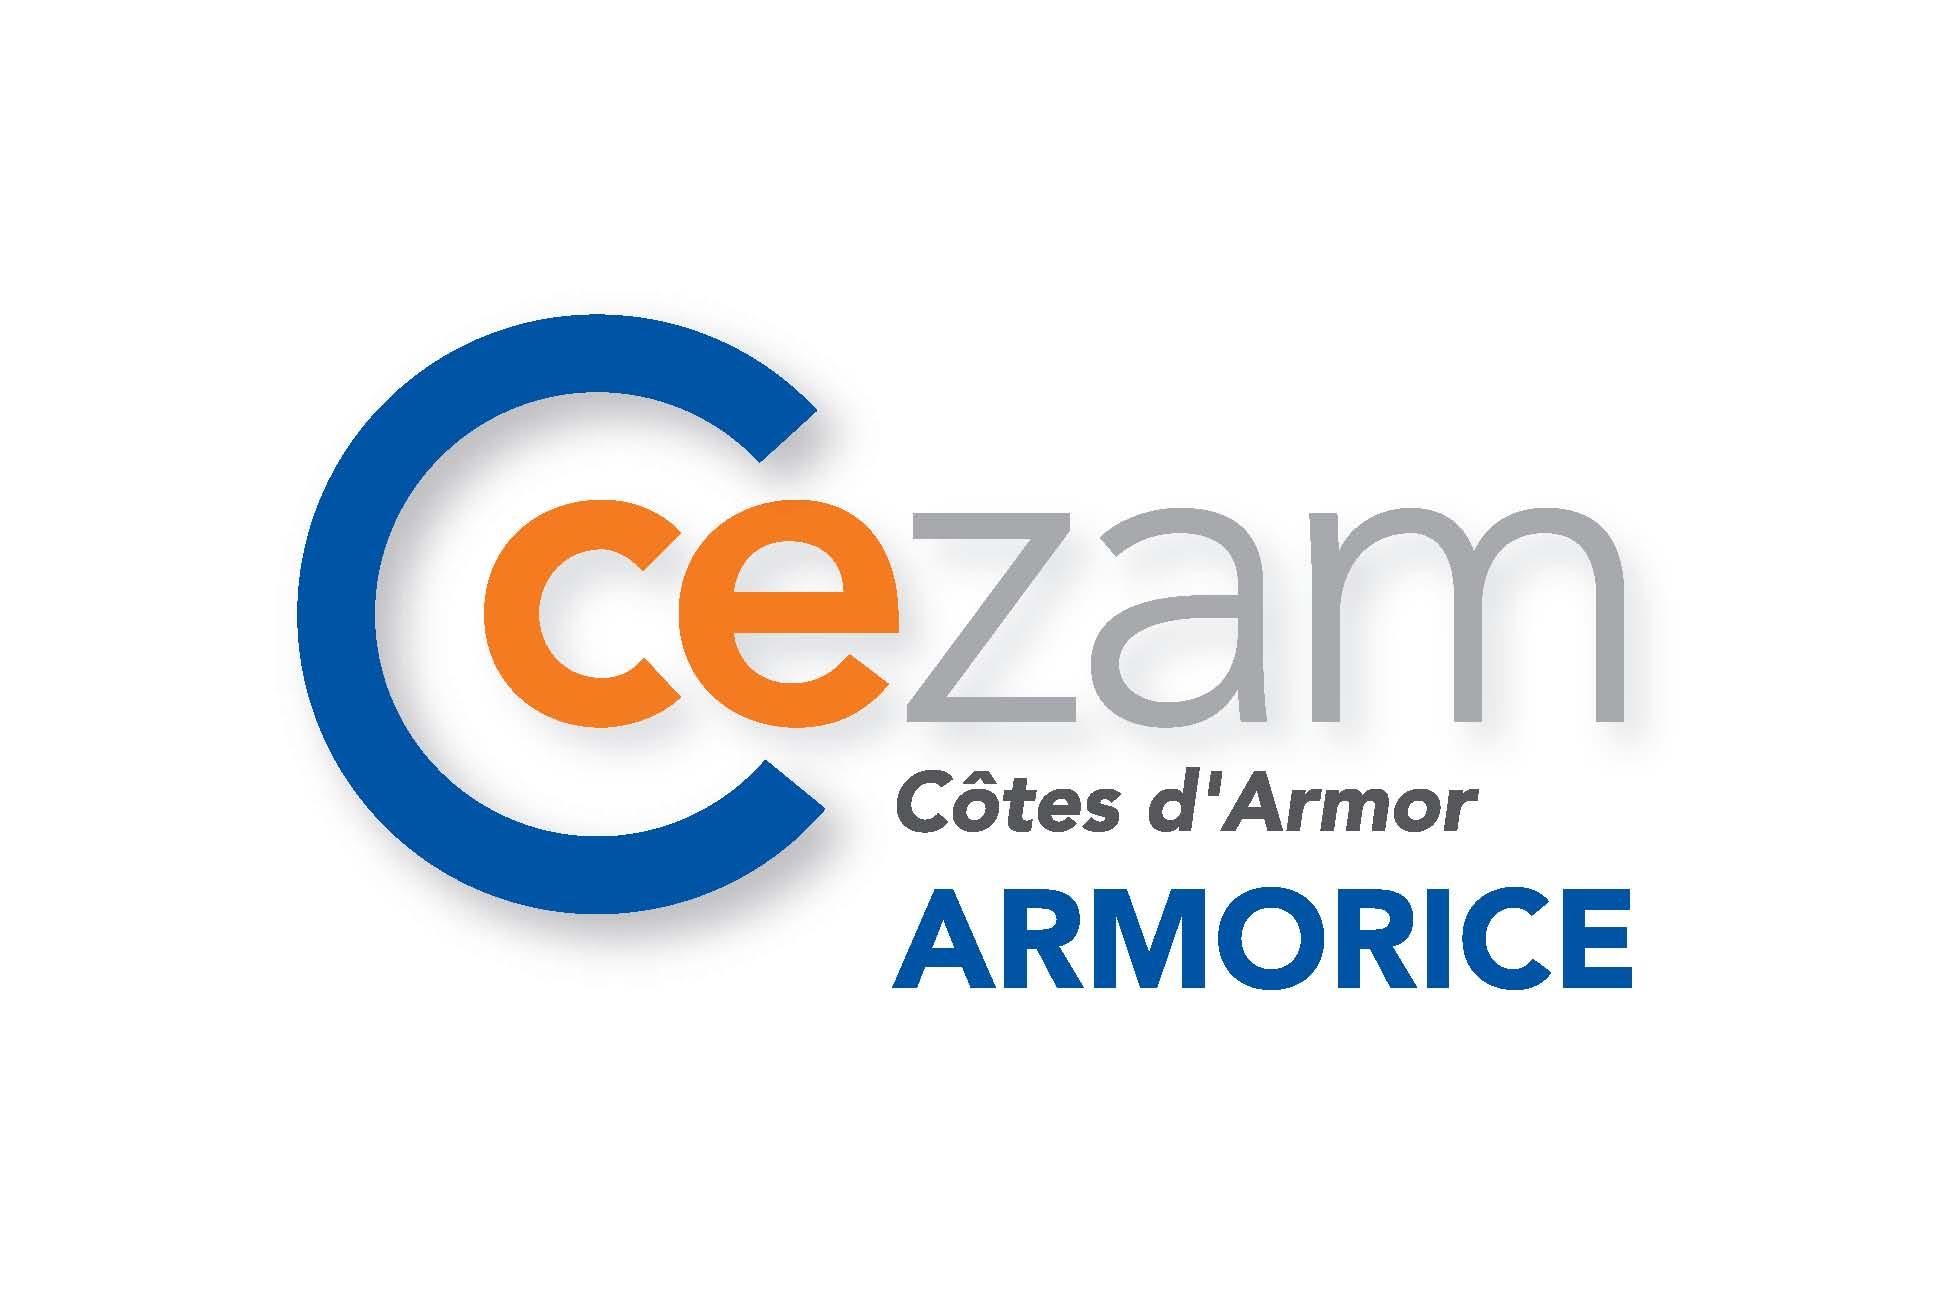 Cezam Côtes d'Armor Armorice